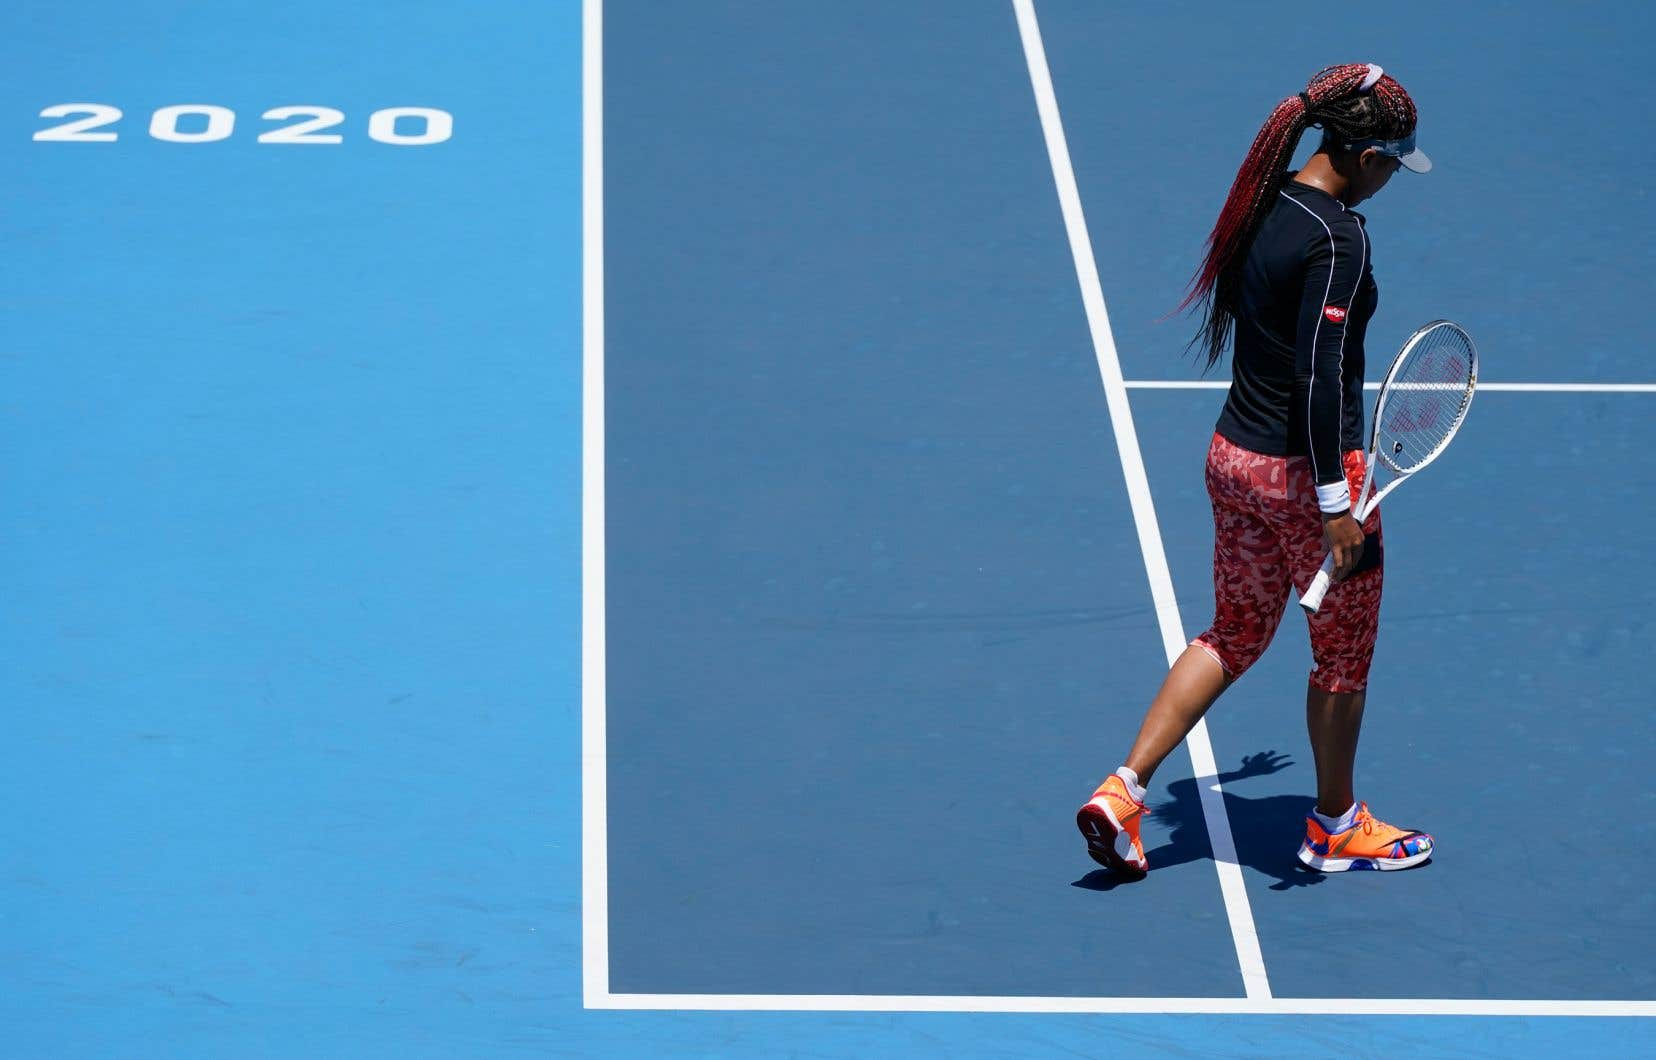 La joueuse de tennis Naomi Osaka